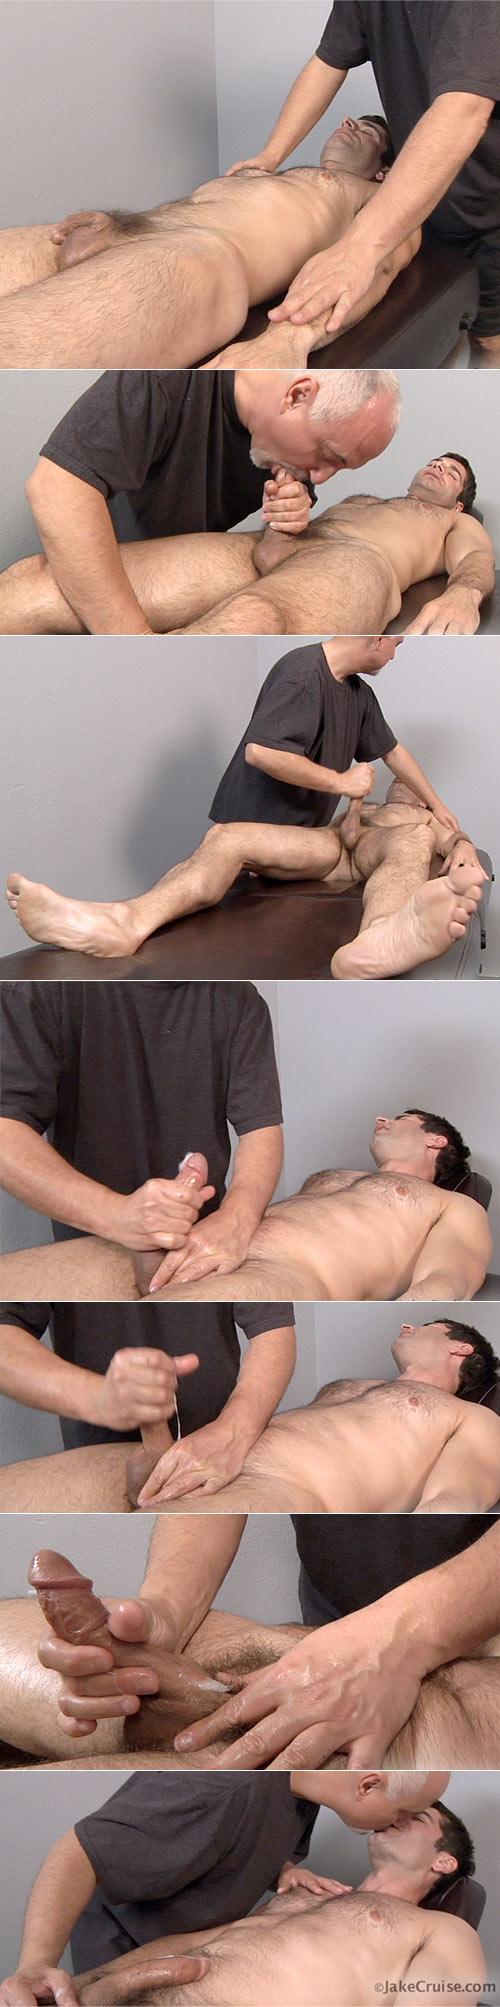 Mario Yanko (Bareback Massaged) at Jake Cruise